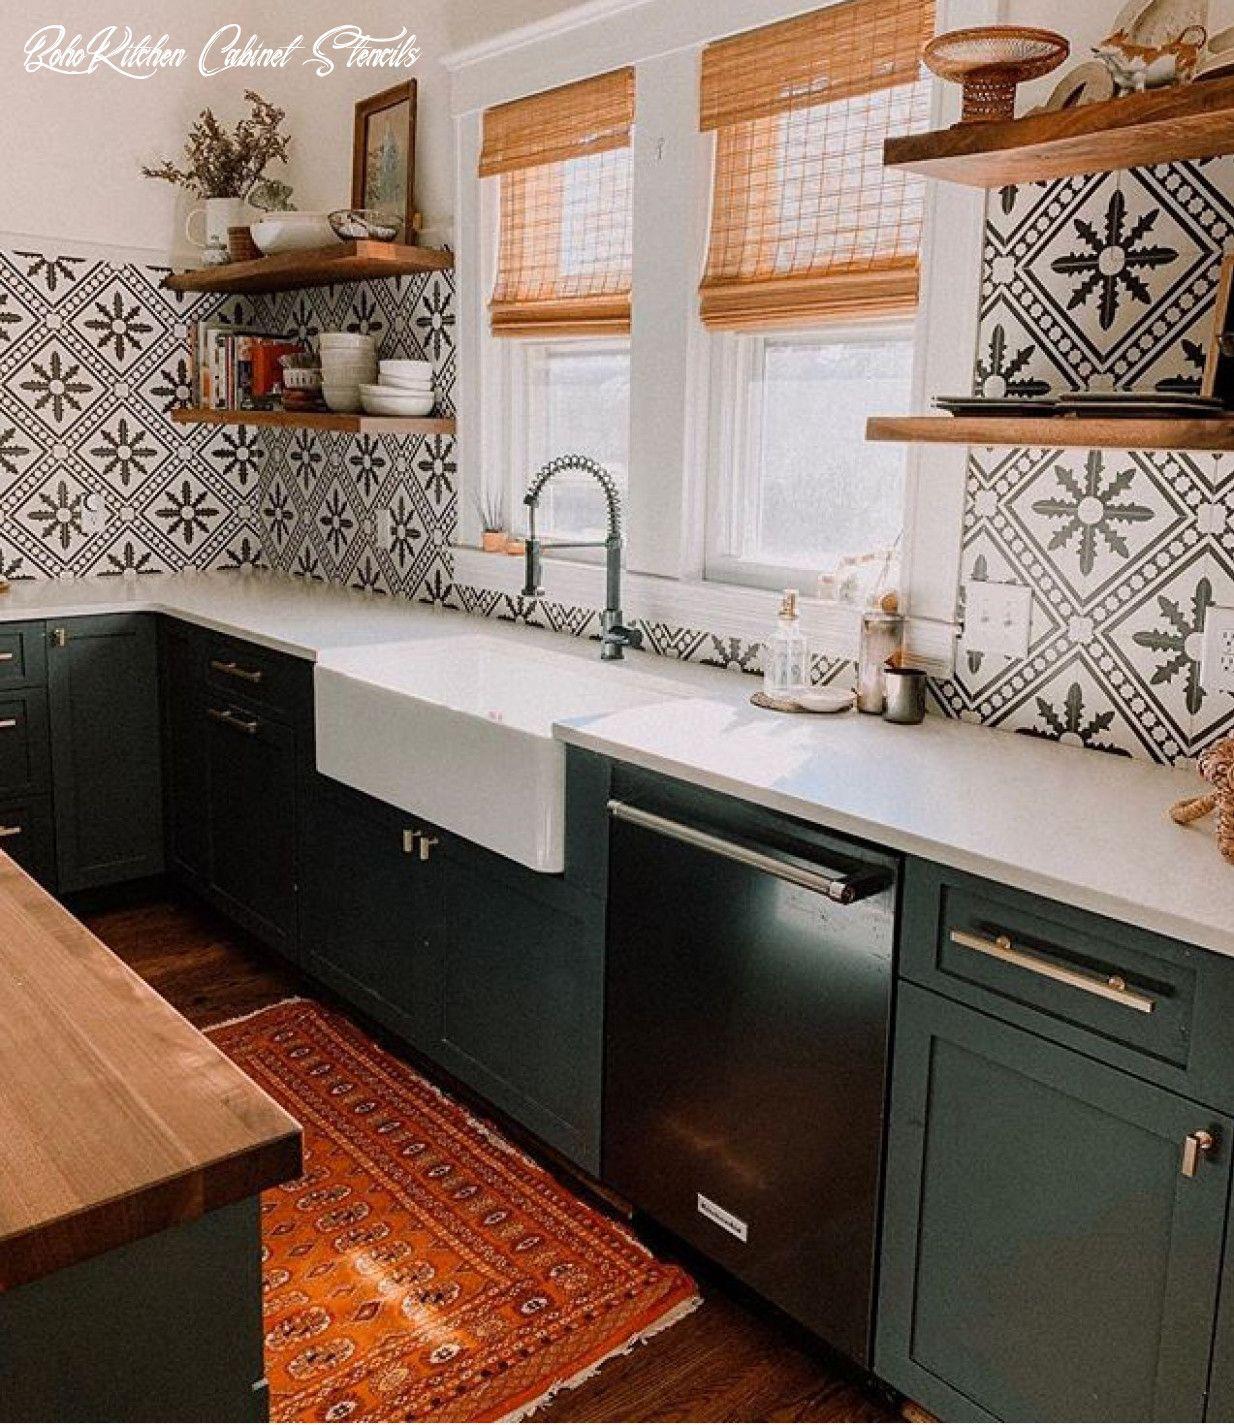 Boho Kitchen Cabinet Stencils In 2020 Home Decor Kitchen Kitchen Remodel Home Kitchens